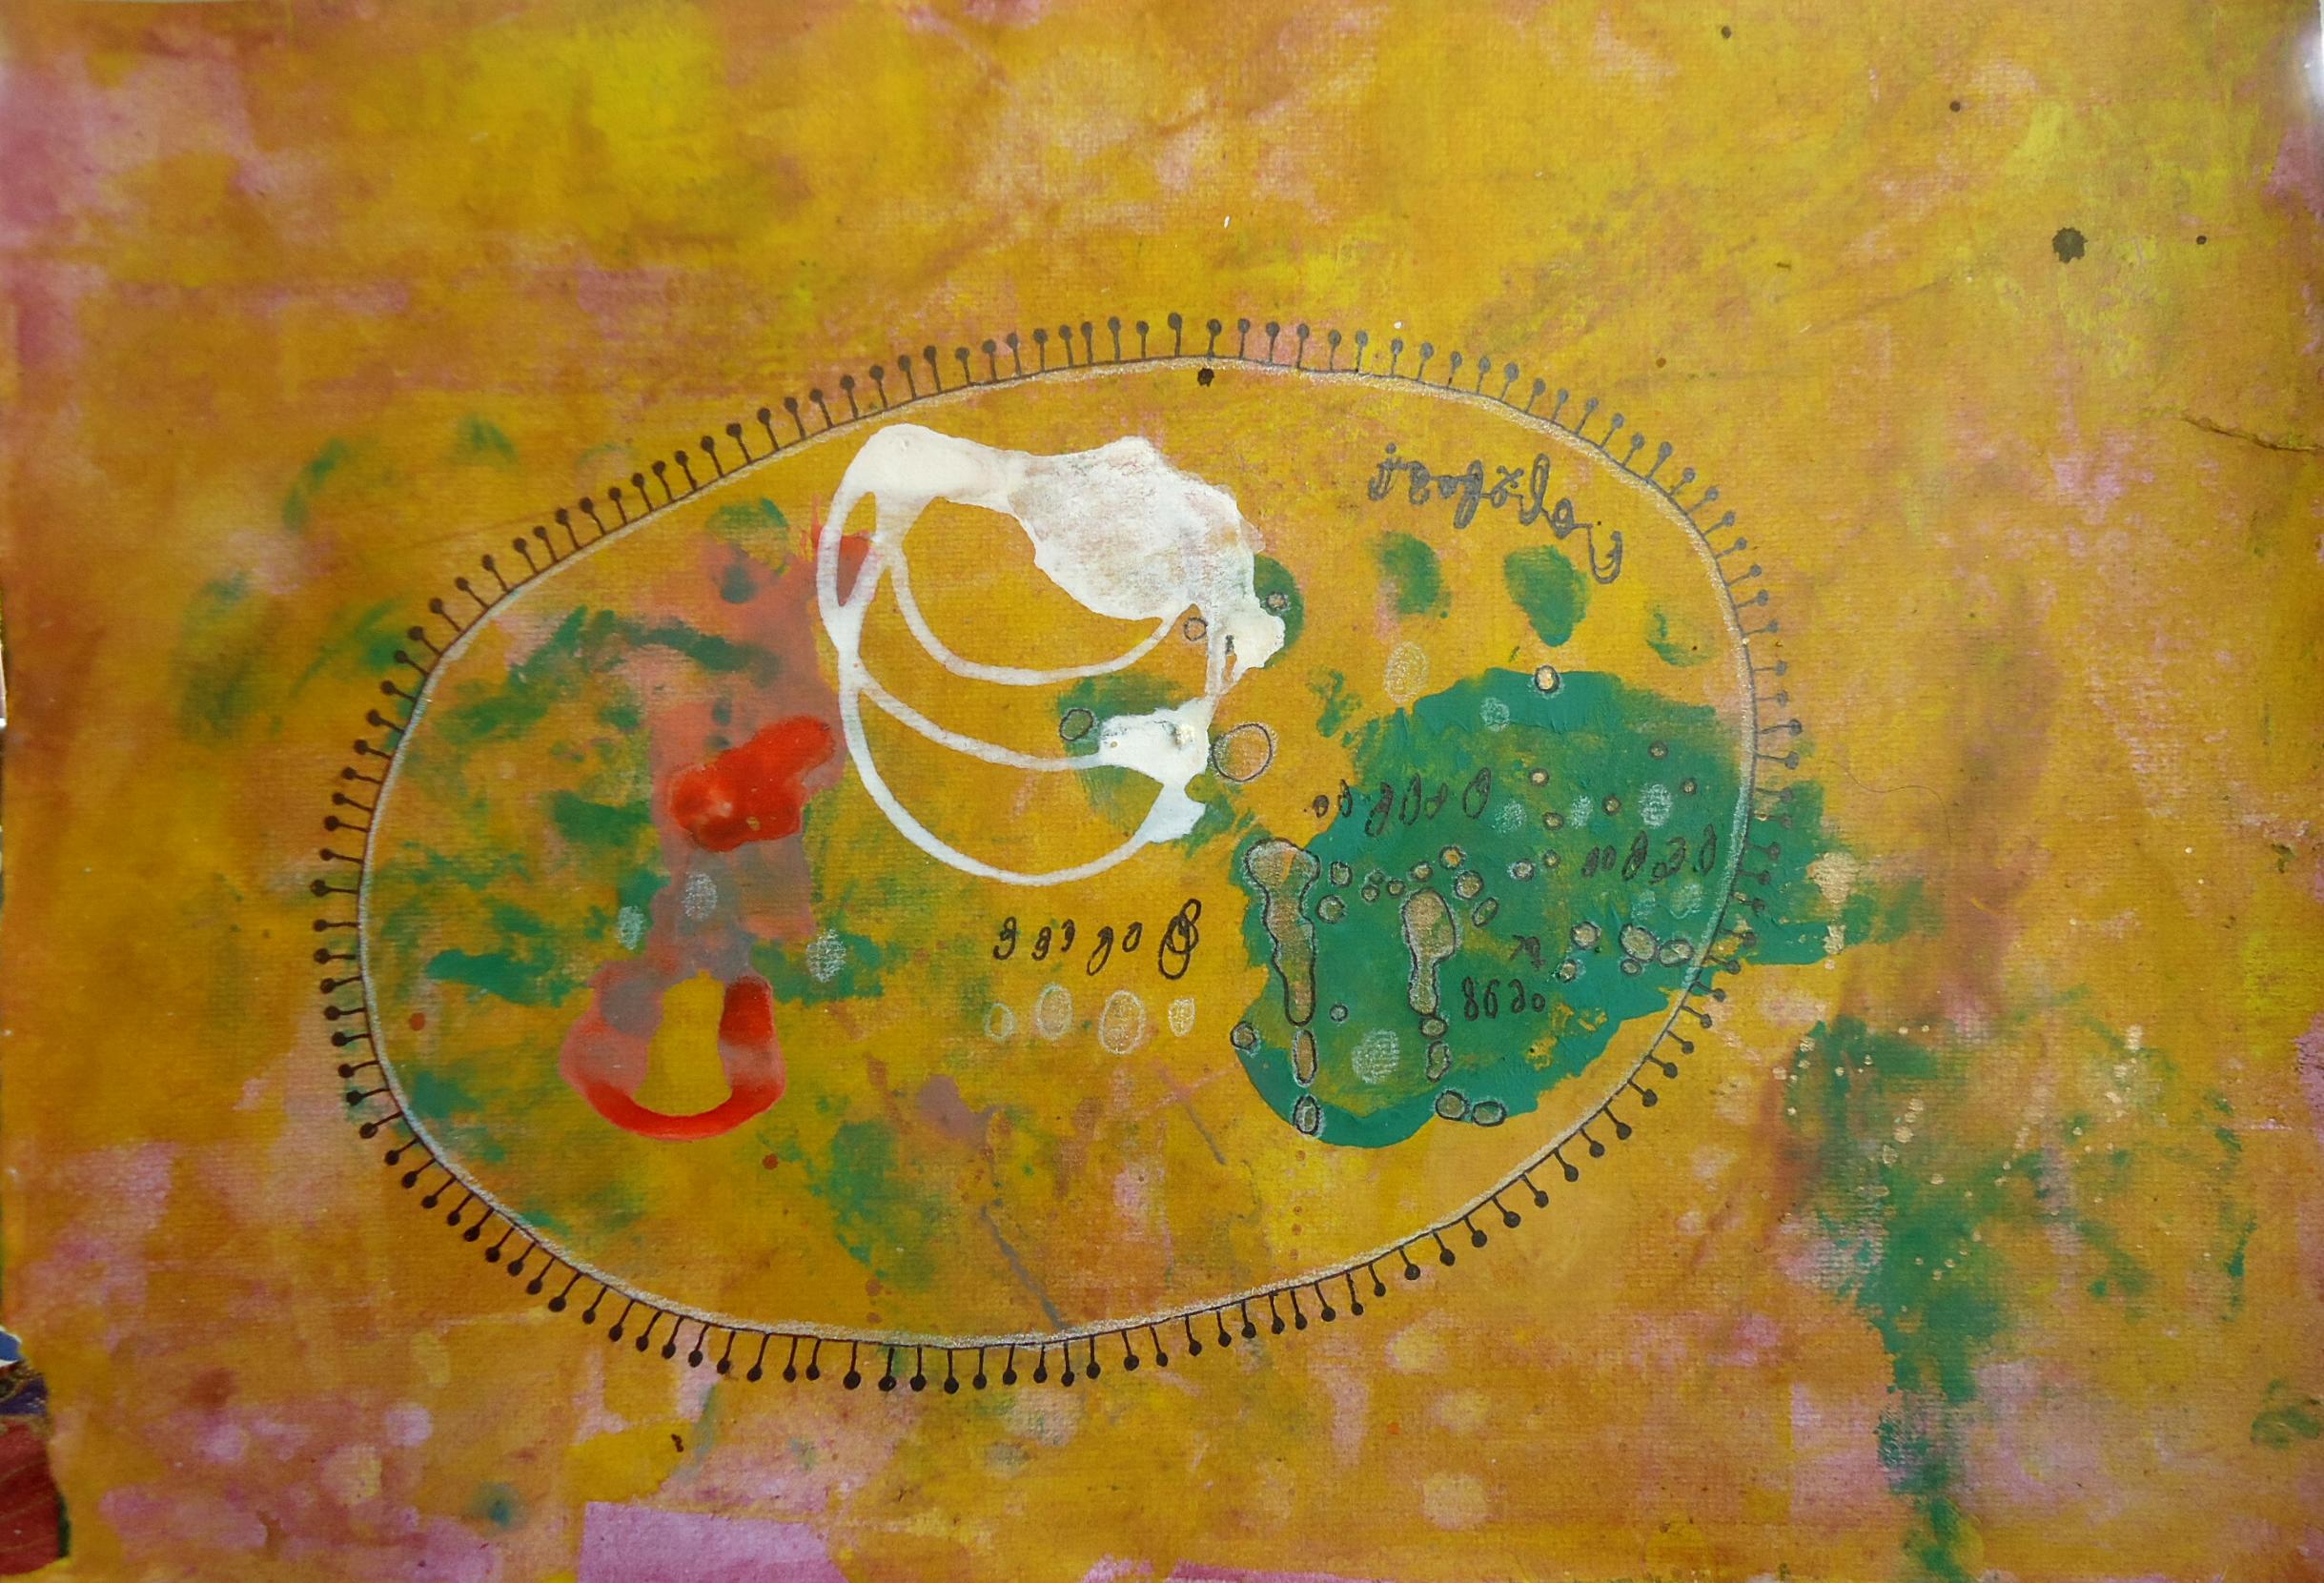 ARTDOXA - Community for Contemporary Art - sergei ivanov